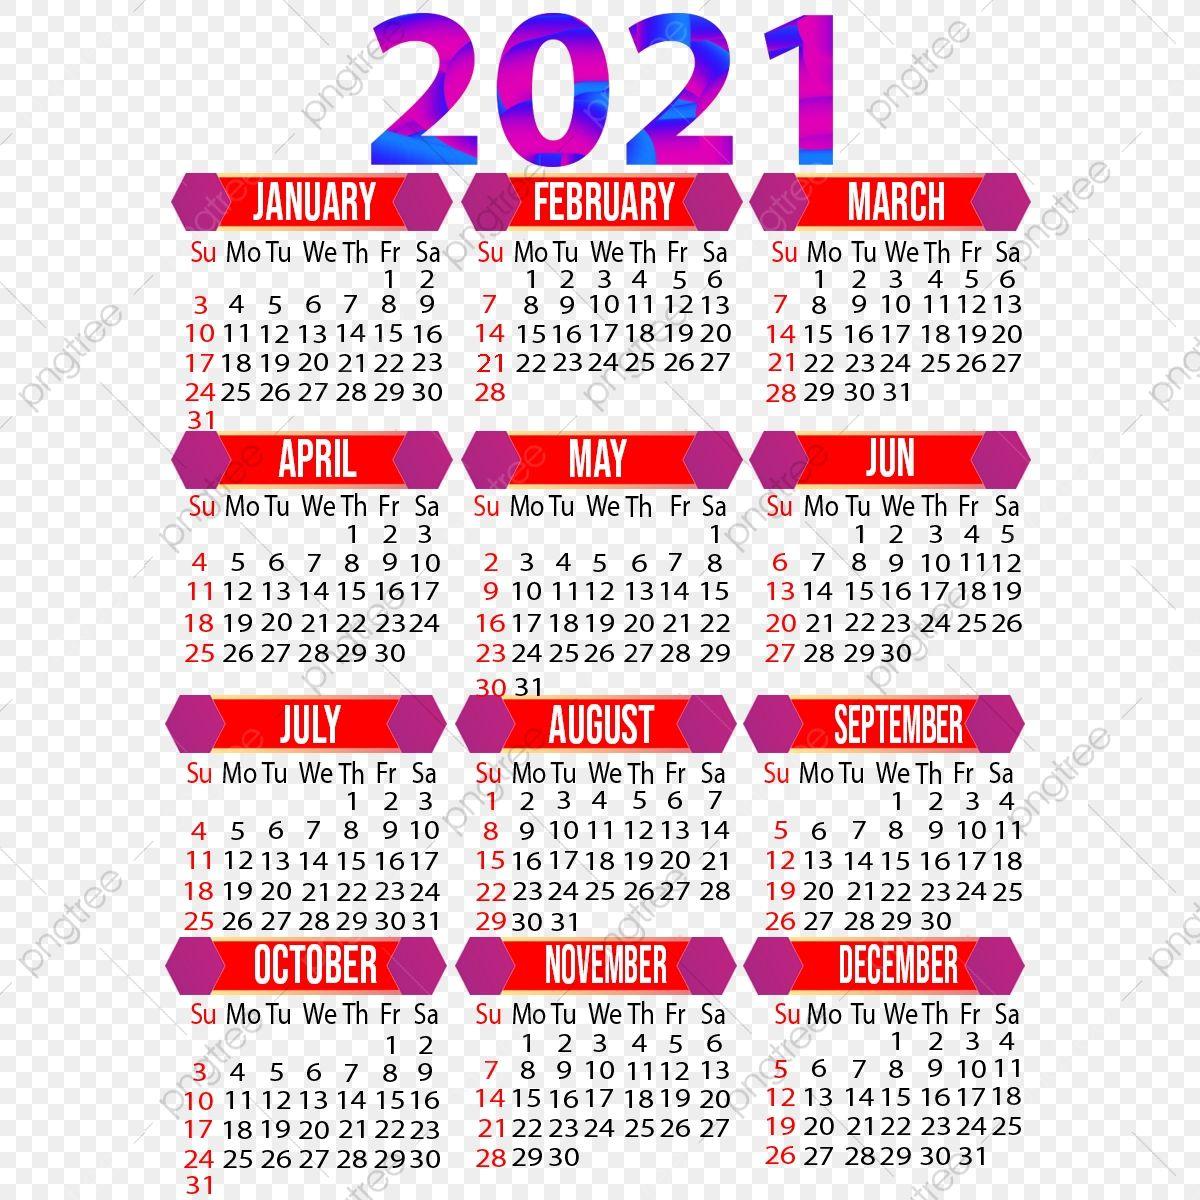 Year 2021 Creative Calendar Design 2021 2021 Calendar